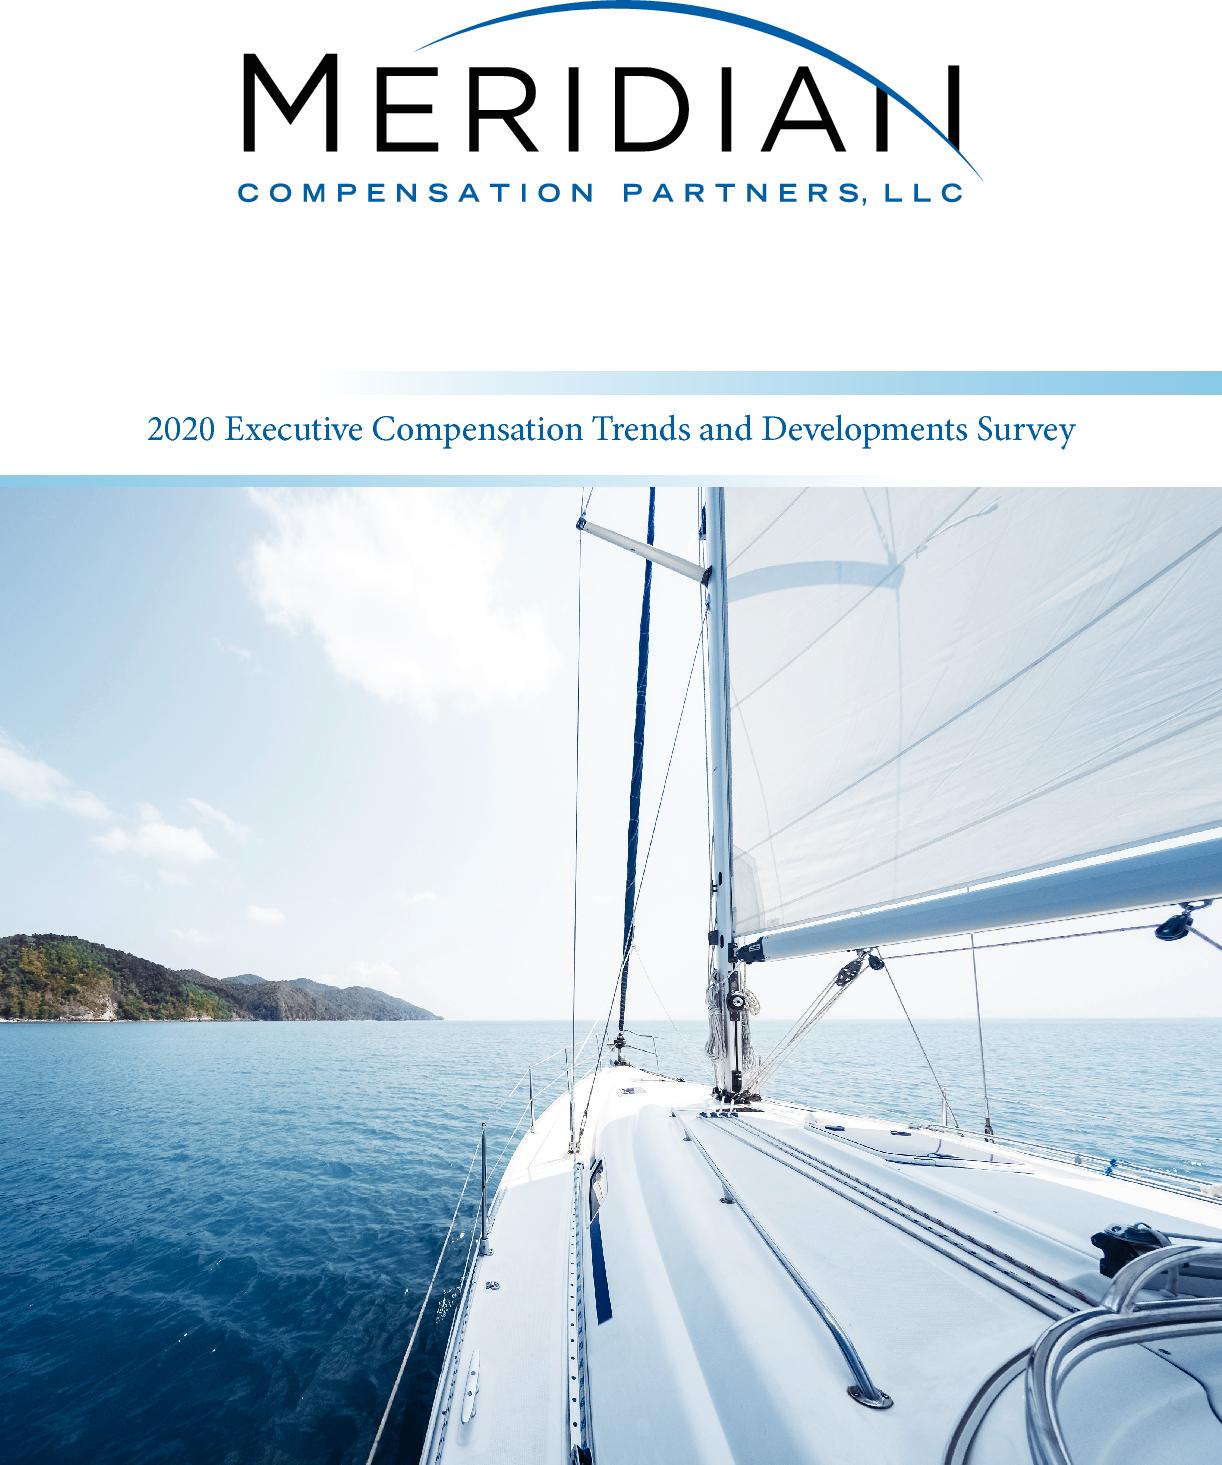 2020 Executive Compensation Trends and Developments (PDF)